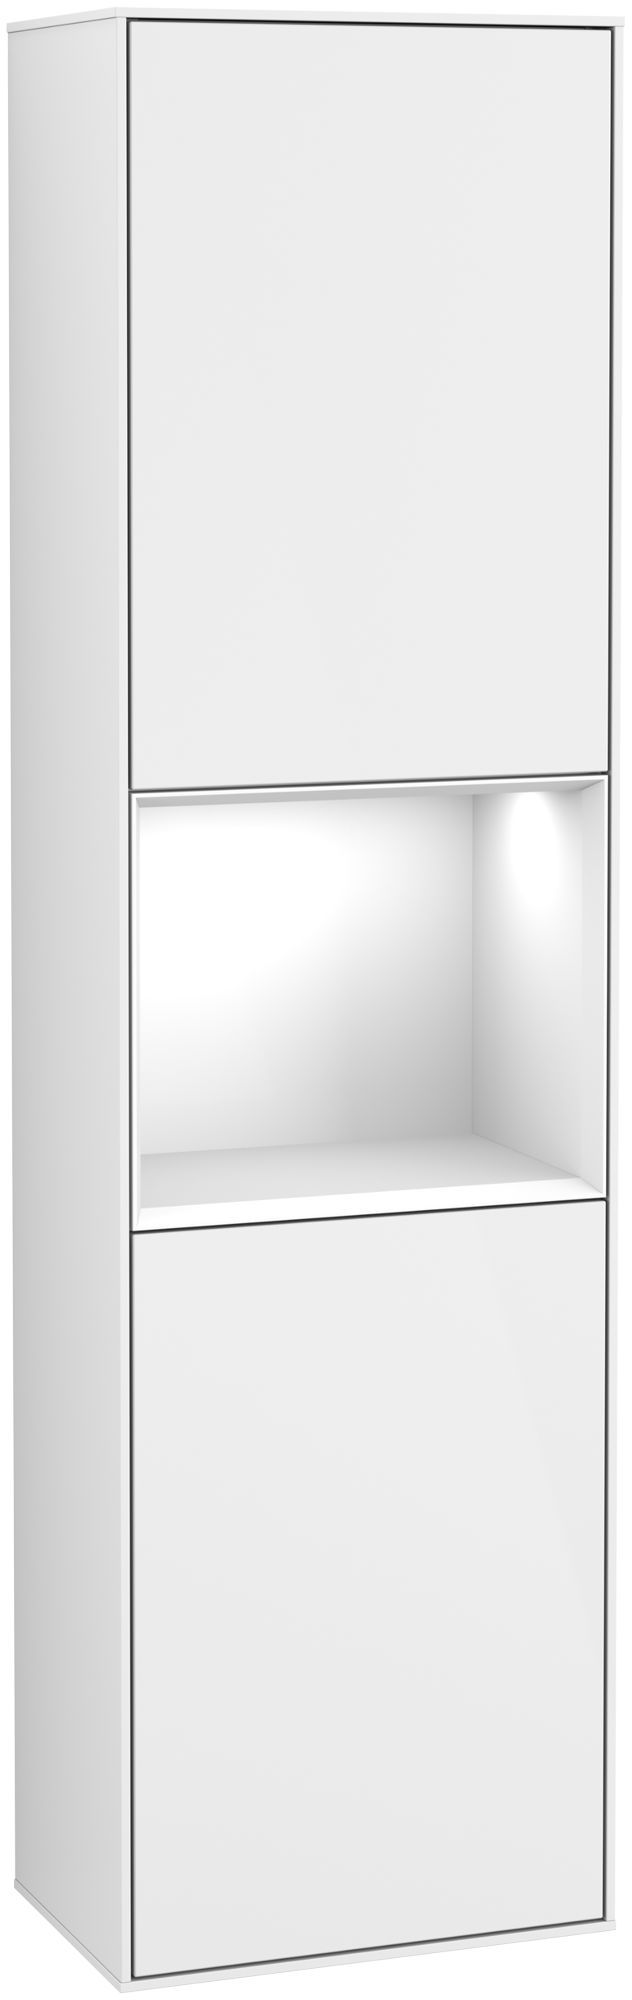 Villeroy & Boch Finion F47 Hochschrank mit Regalelement 2 Türen Anschlag rechts LED-Beleuchtung B:41,8xH:151,6xT:27cm Front, Korpus: Glossy White Lack F470GFGF